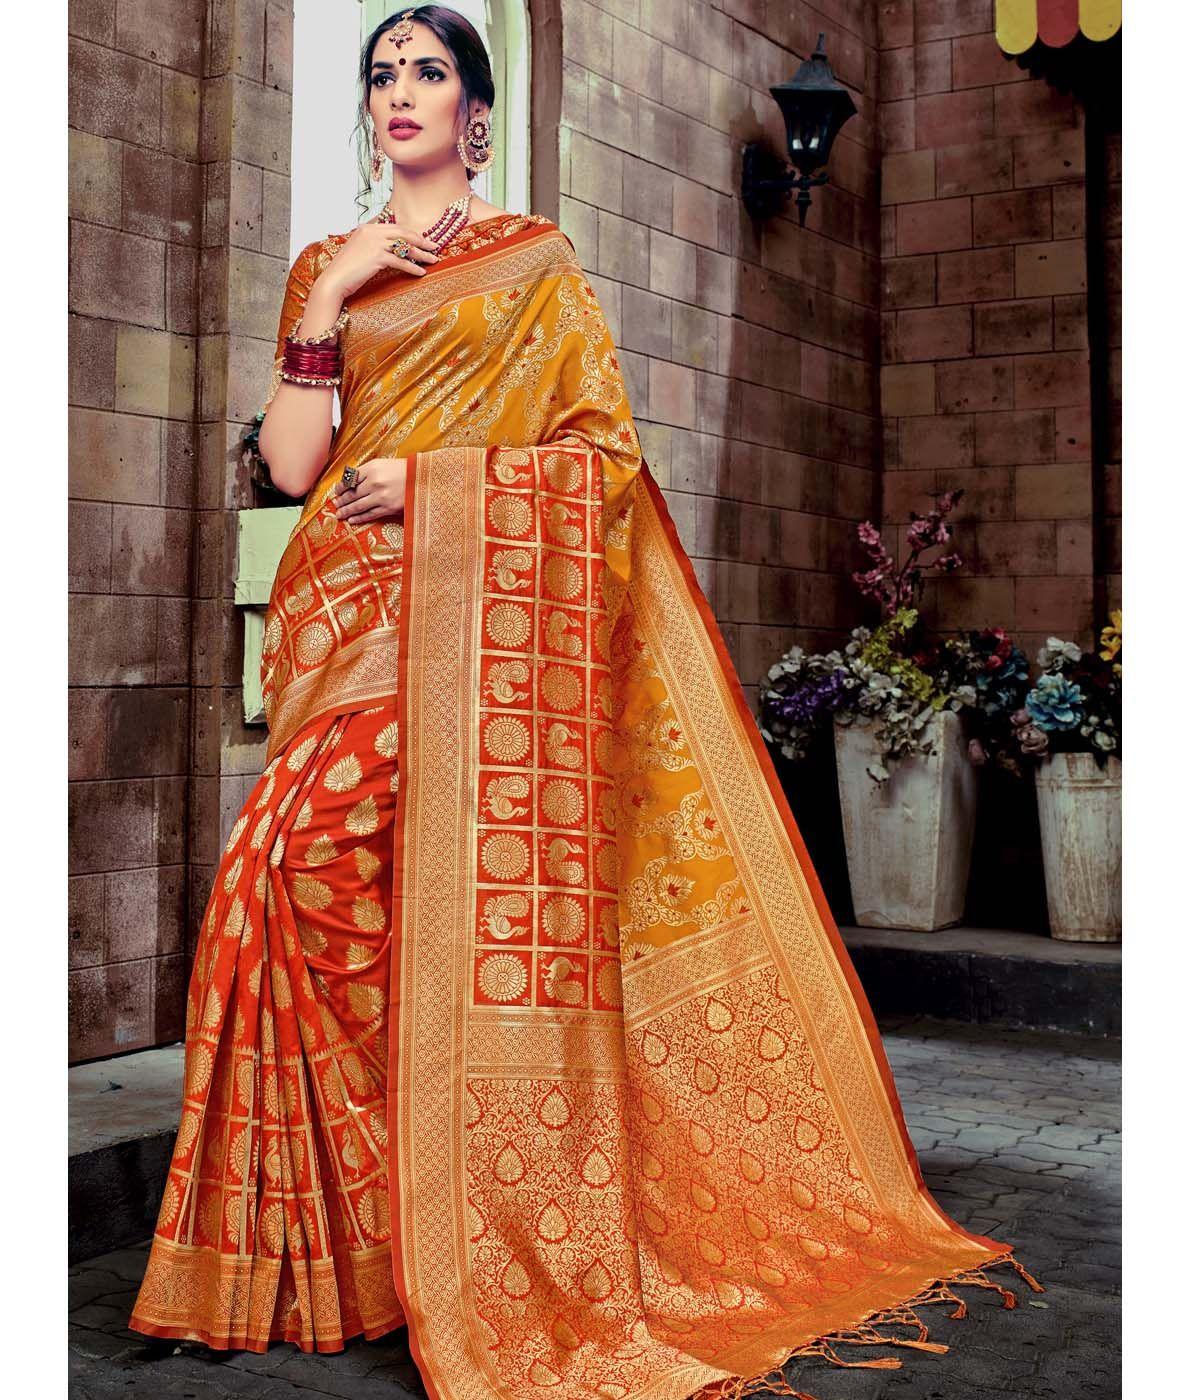 b6dfbebff4638 Aspiring Orange   Yellow Color Designer Banarasi Silk Saree ...